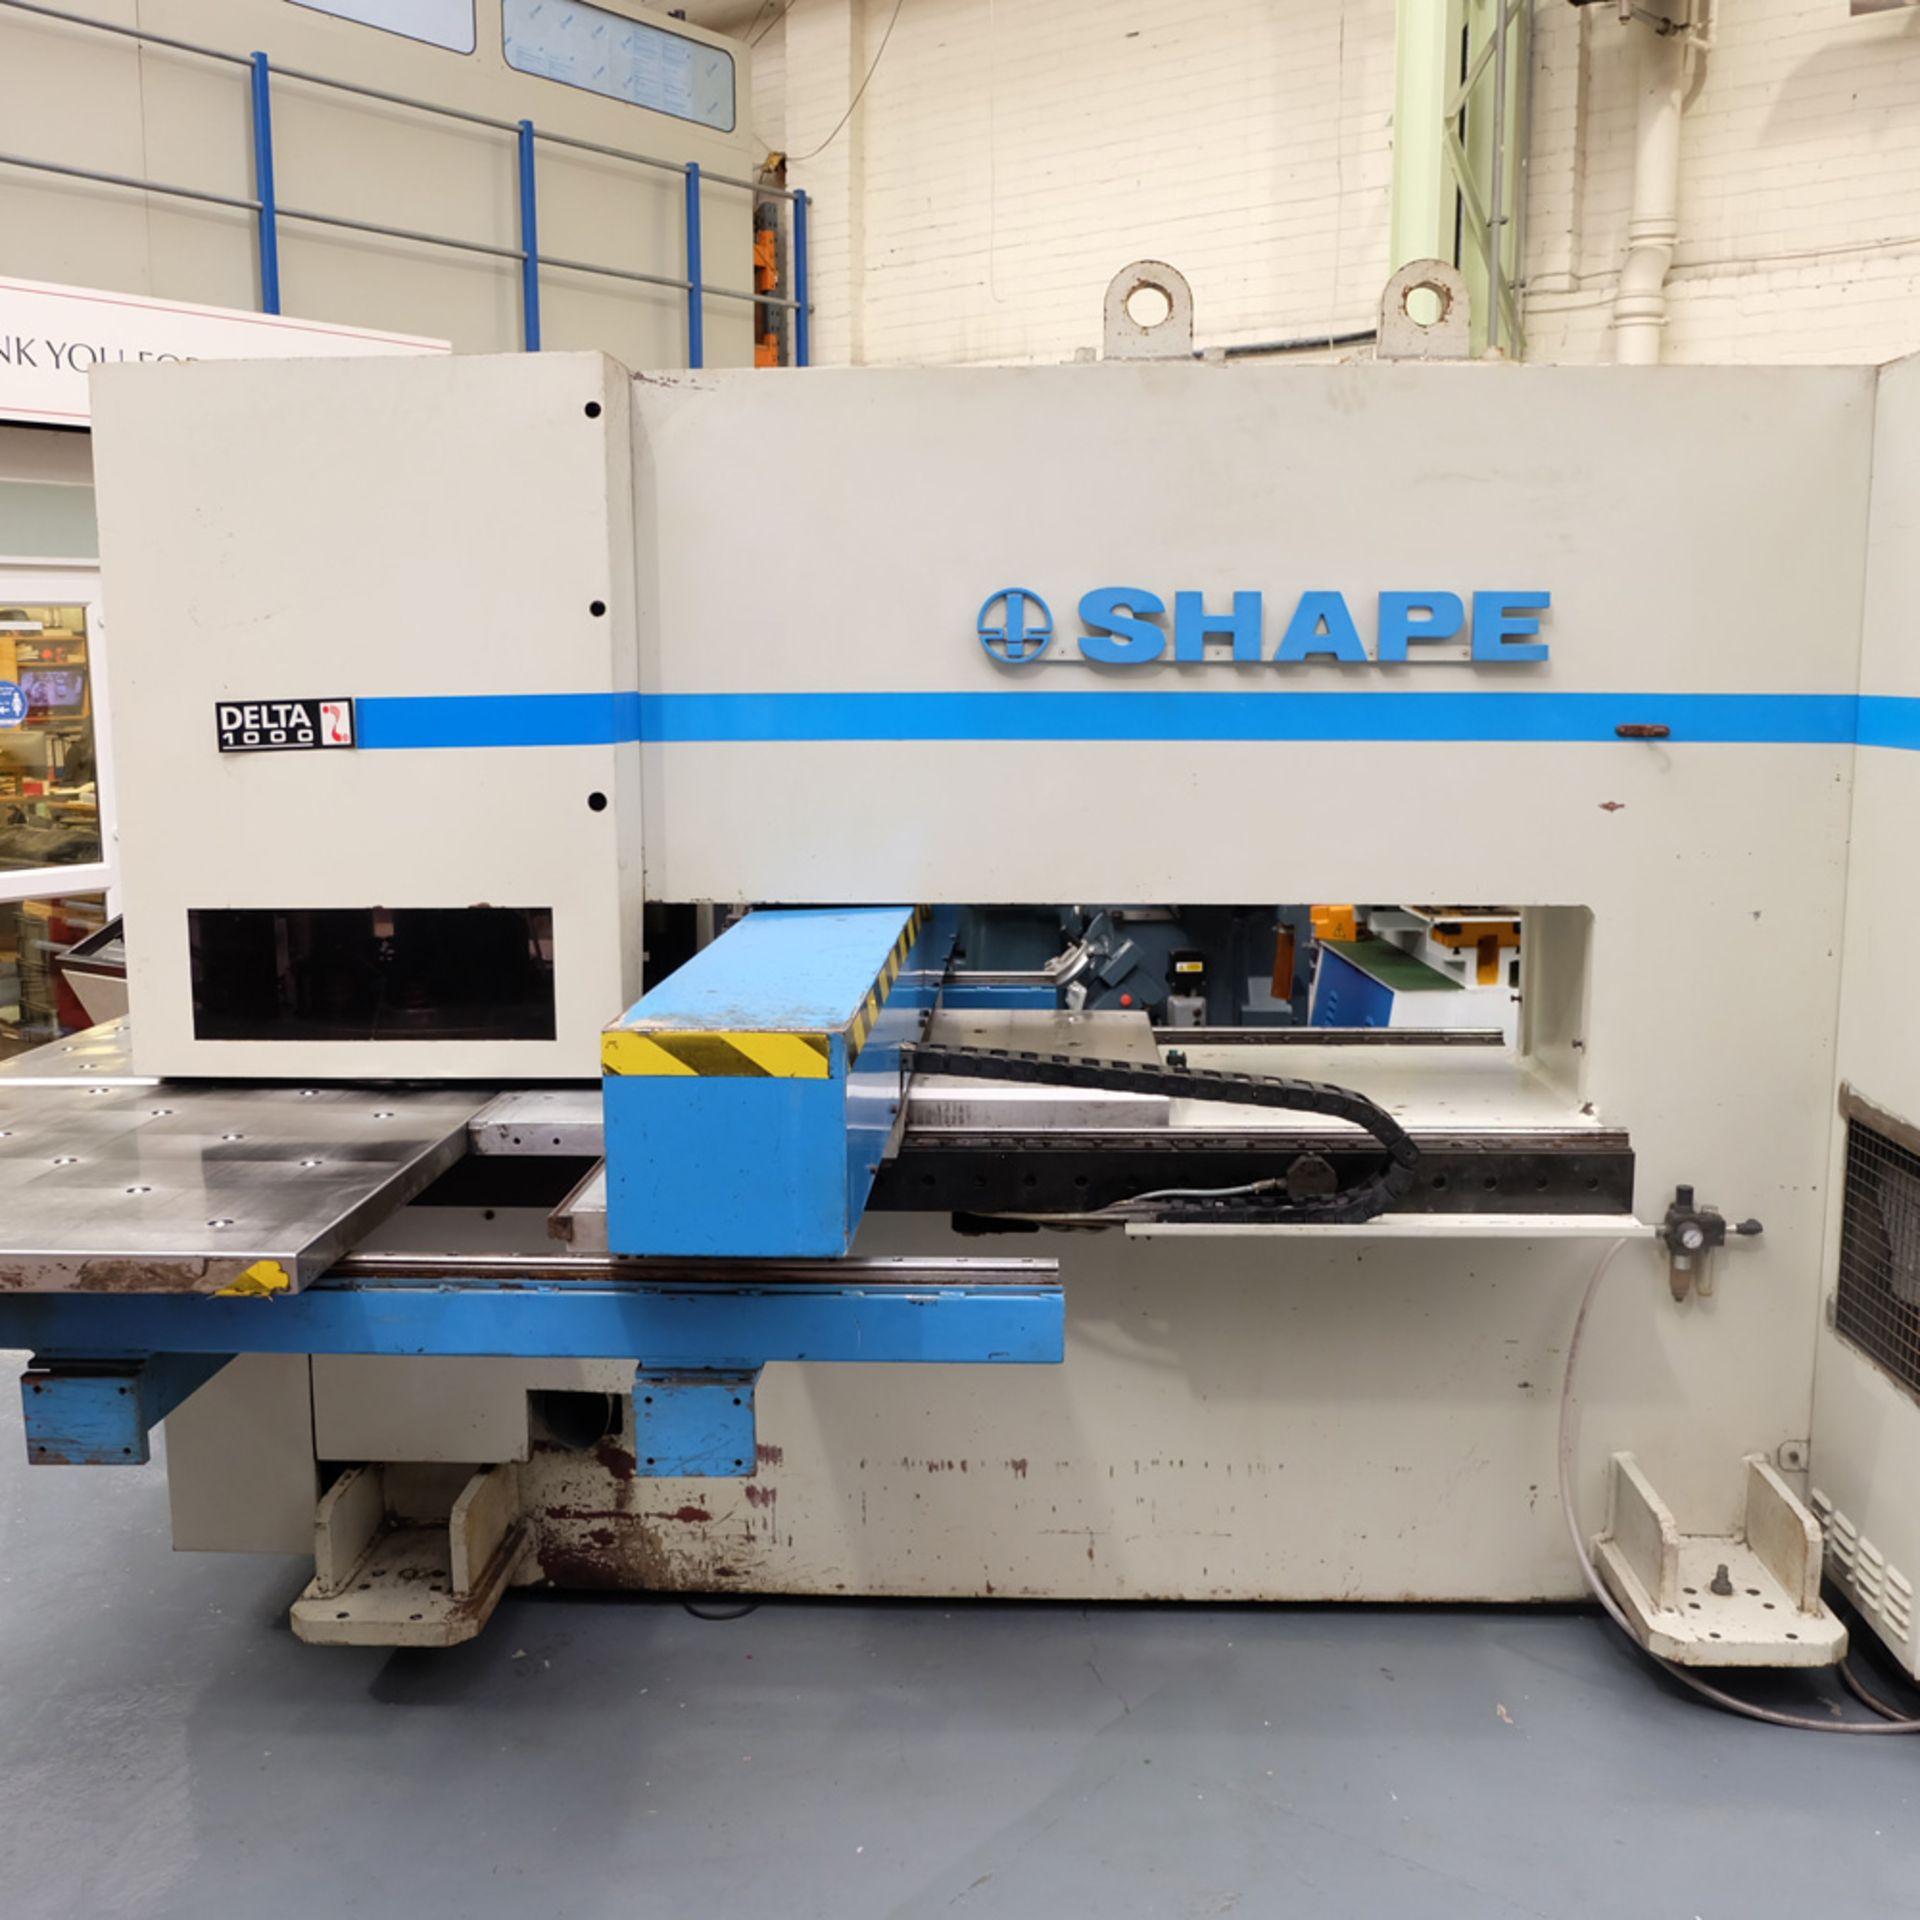 LVD Shape Delta 1000 Thick CNC Turret Punching Machine. - Image 5 of 18